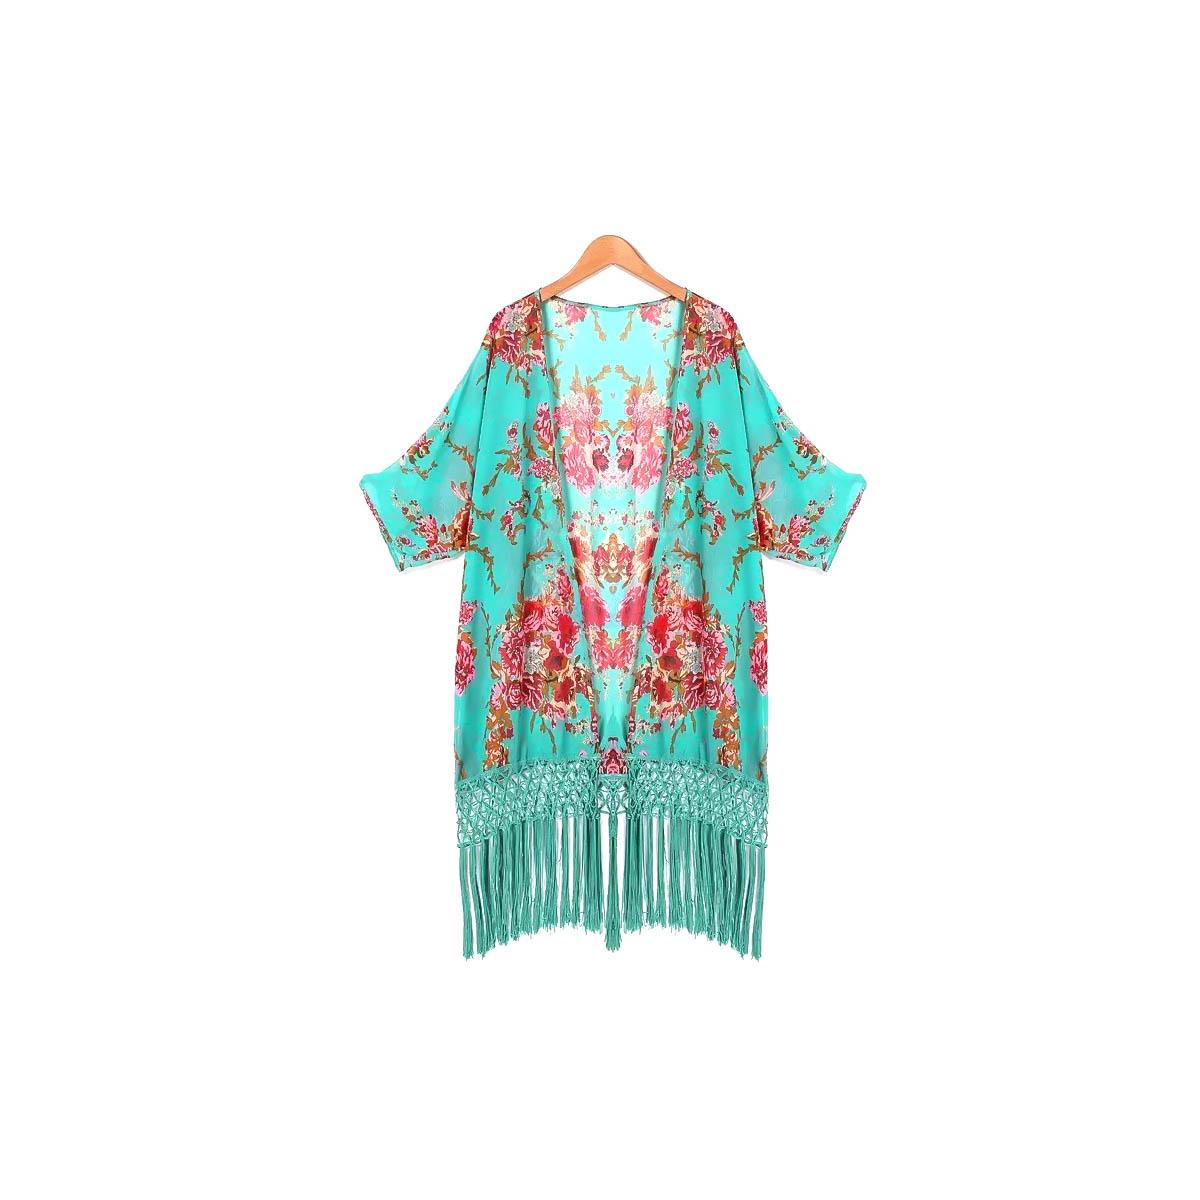 IAG-Womens-Floral-Fringed-Short-Sleeved-Kimono-Jacket-Front-1200×1200